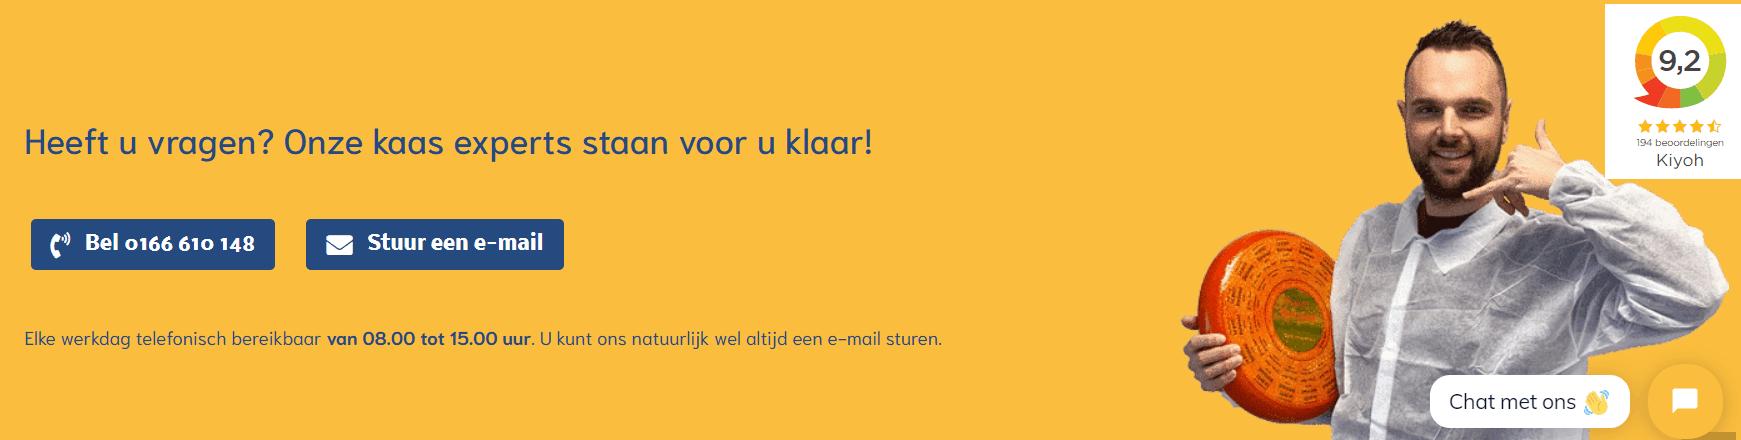 Serviceaanbod van hollandskaashuis nl onder elke website kindpagina Voorbeeld footer